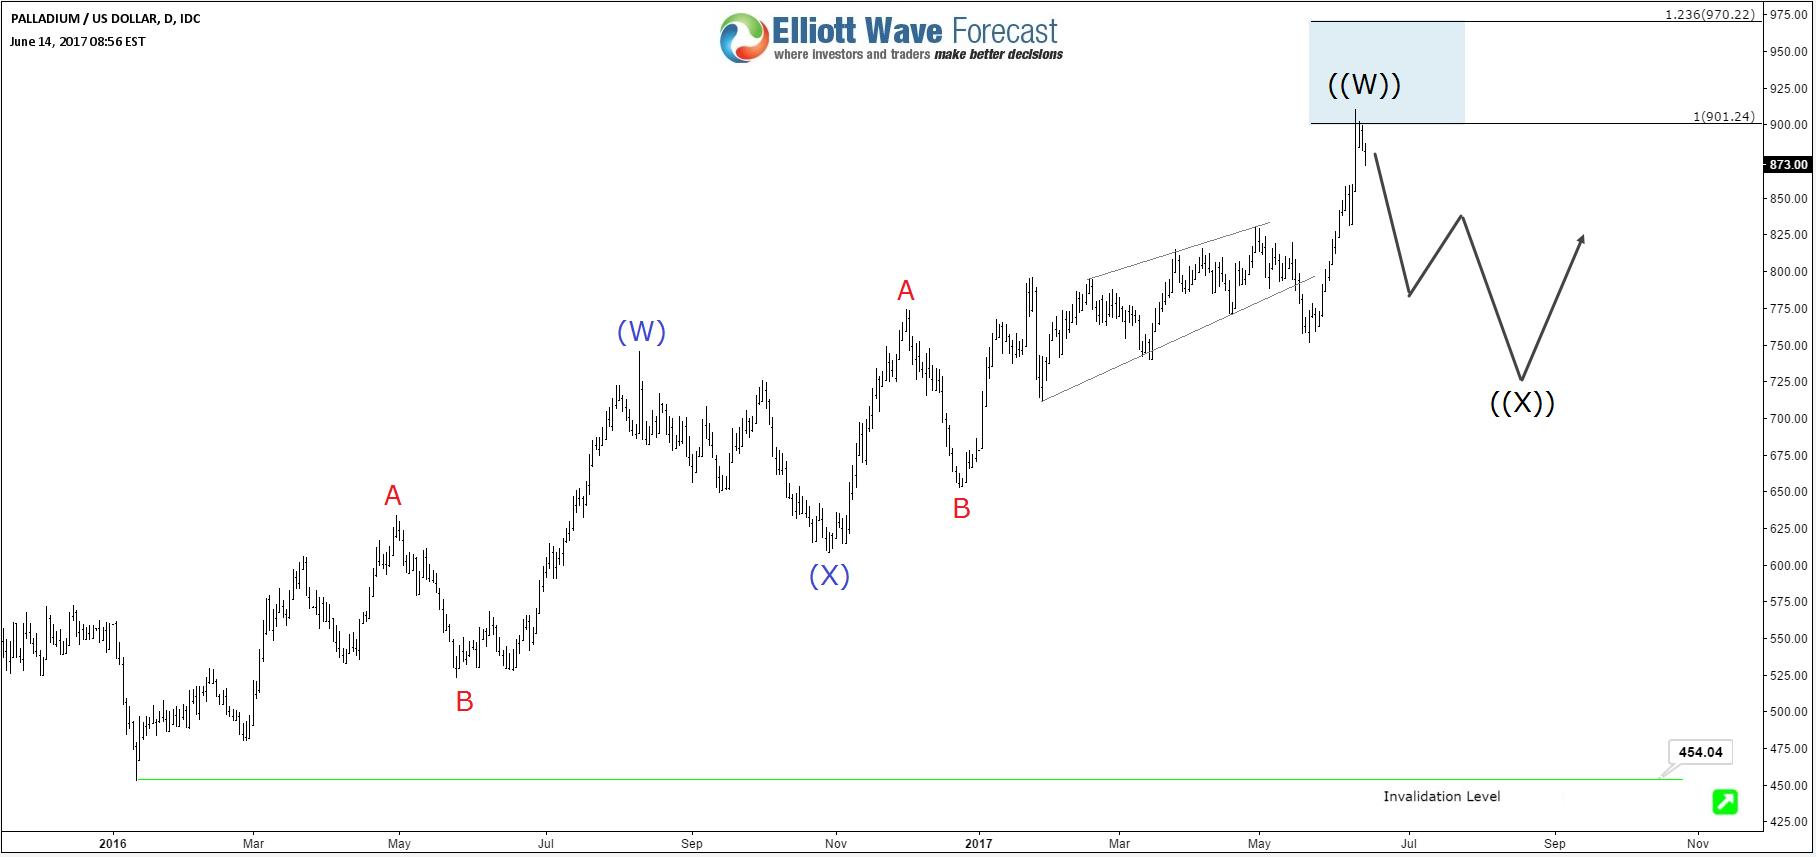 Post «Palladium XPDUSD Elliott Wave Impulse» in blog Elliott